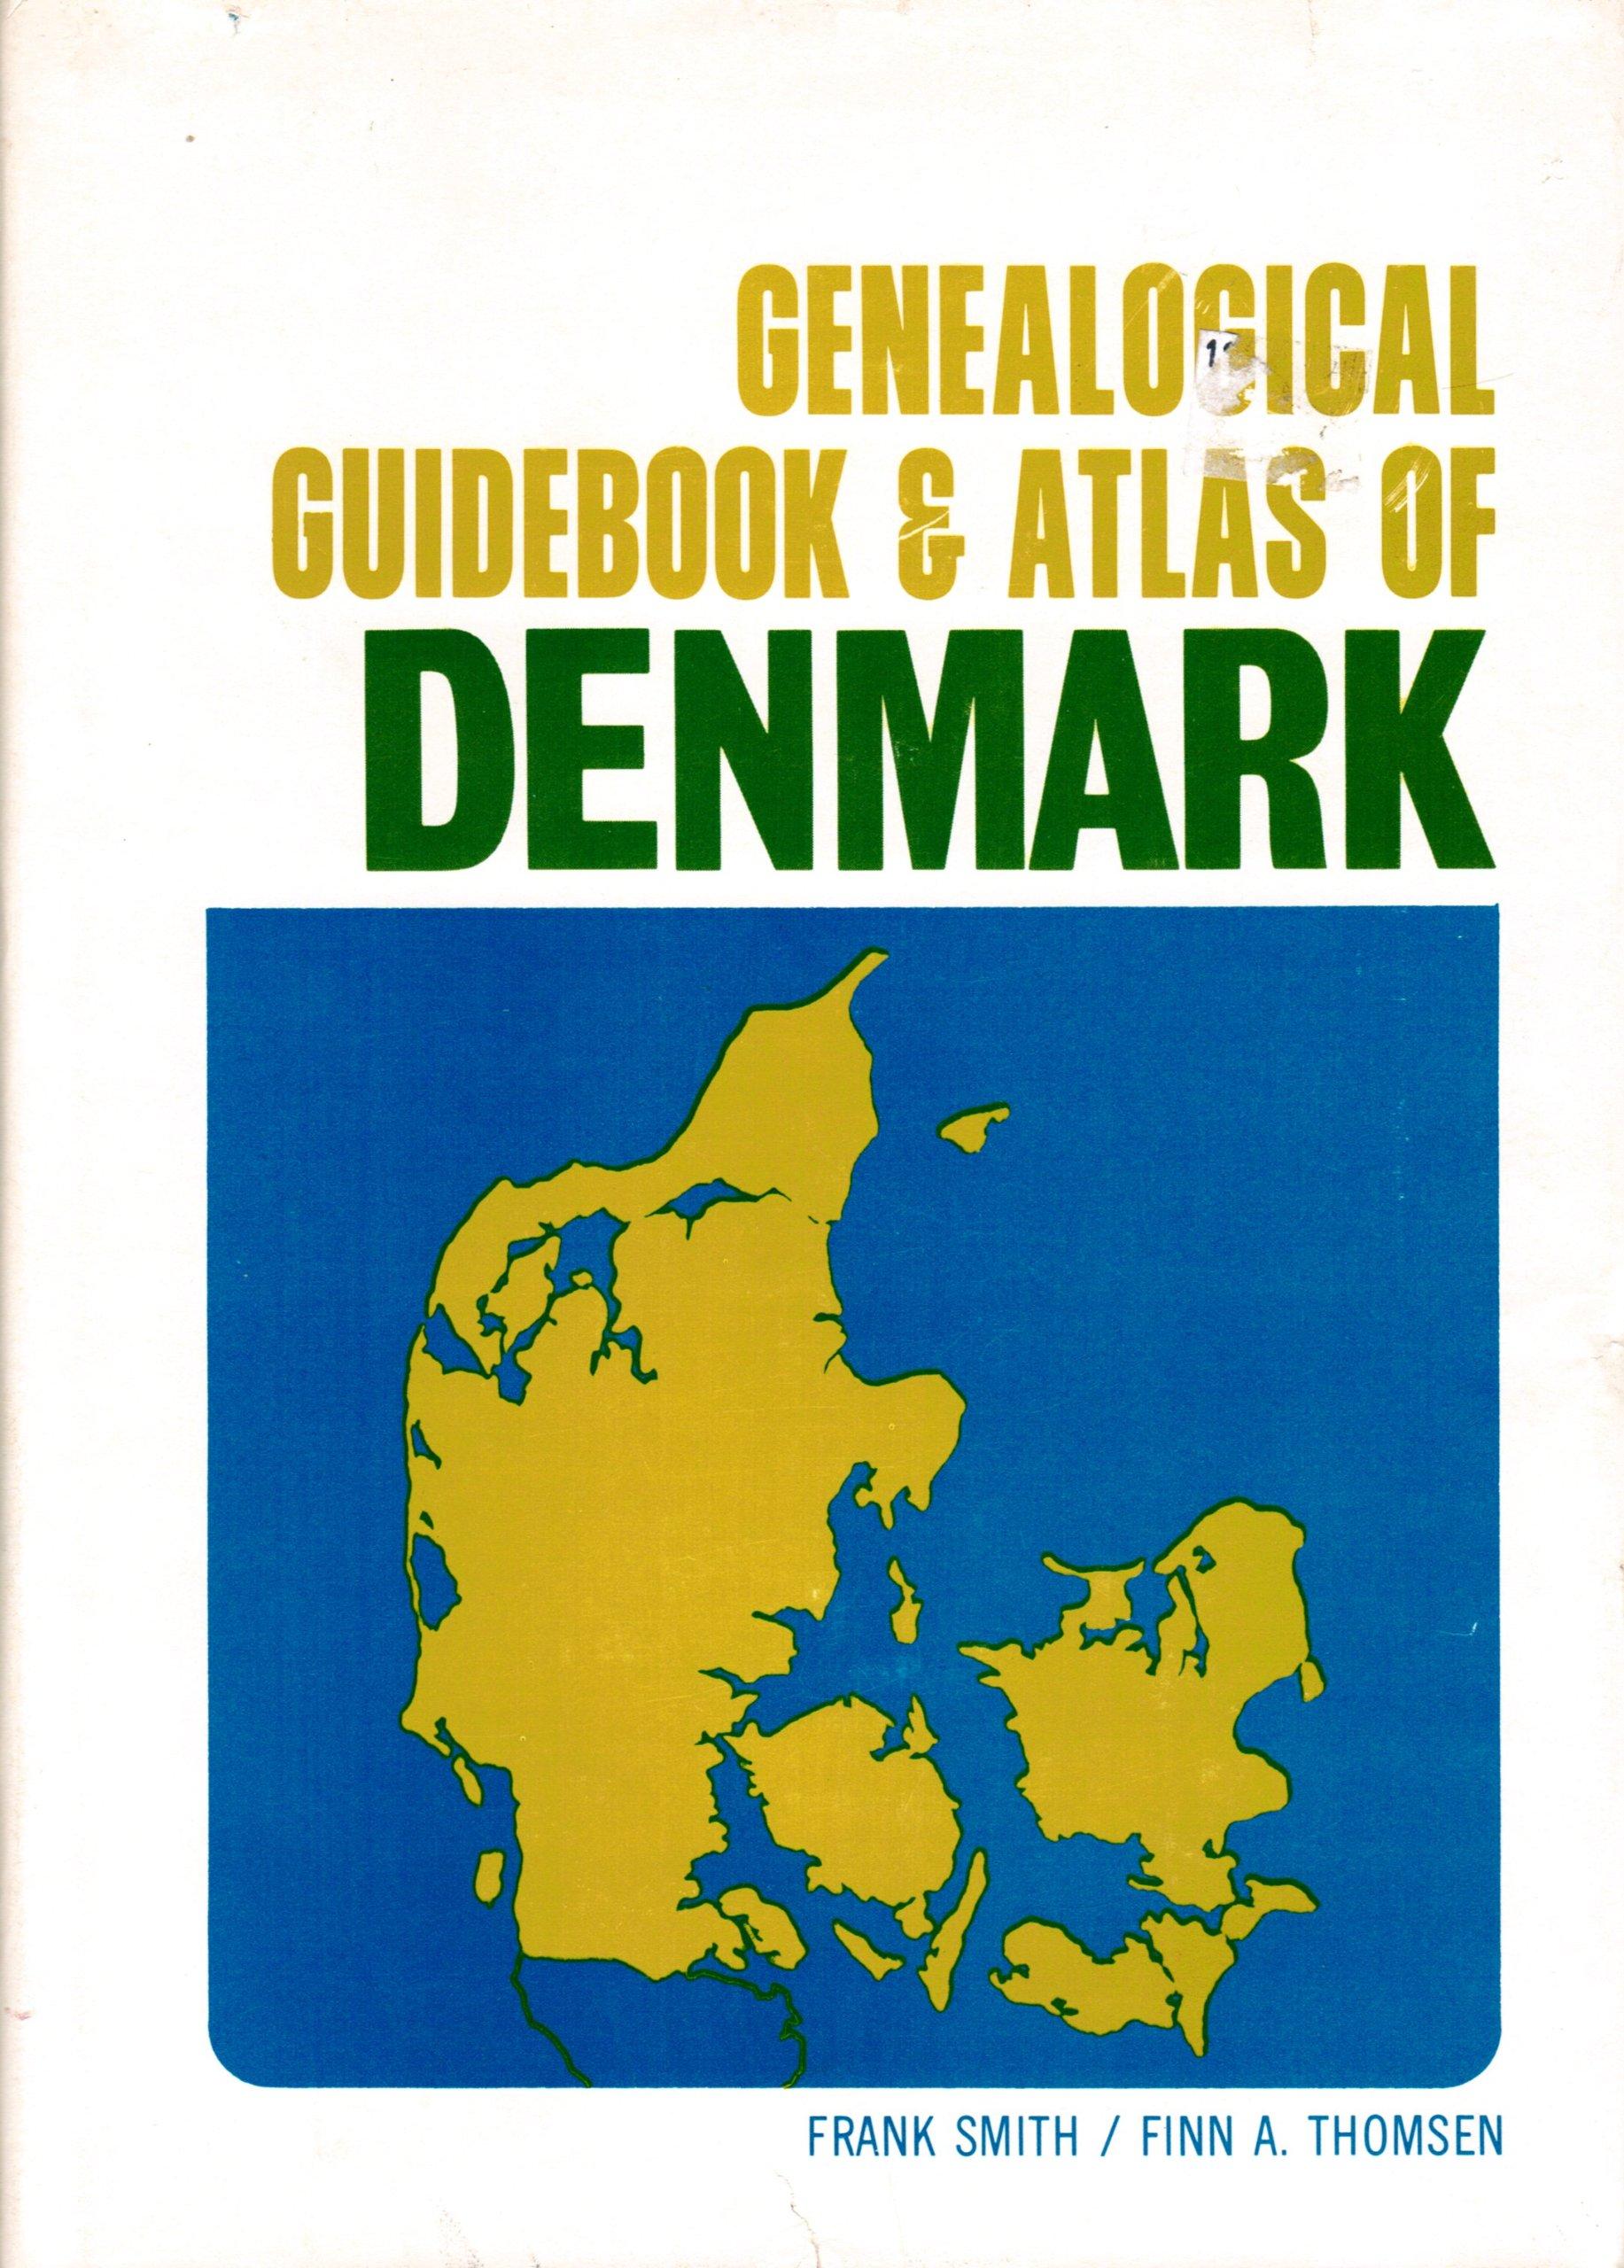 Genealogical Guidebook & Atlas of Denmark, Frank Smith; Finn A. Thomsen